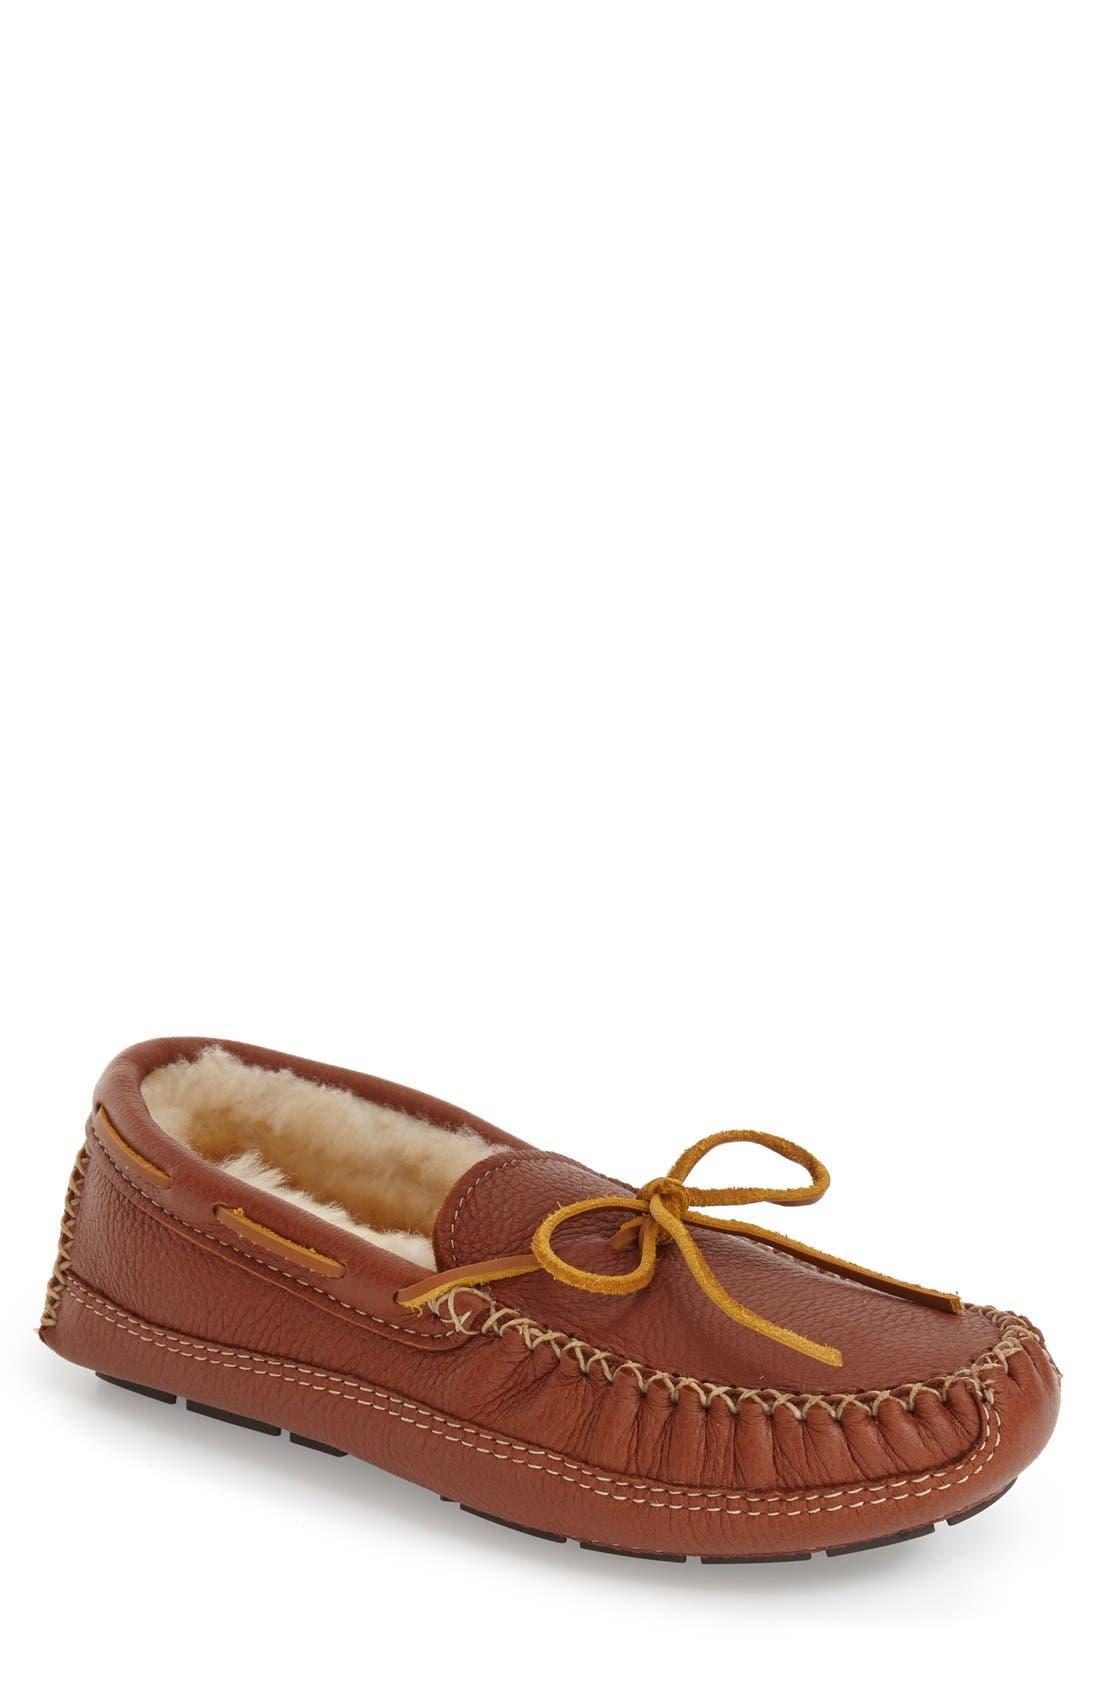 Main Image - Minnetonka Genuine Shearling Lined Leather Slipper (Men)